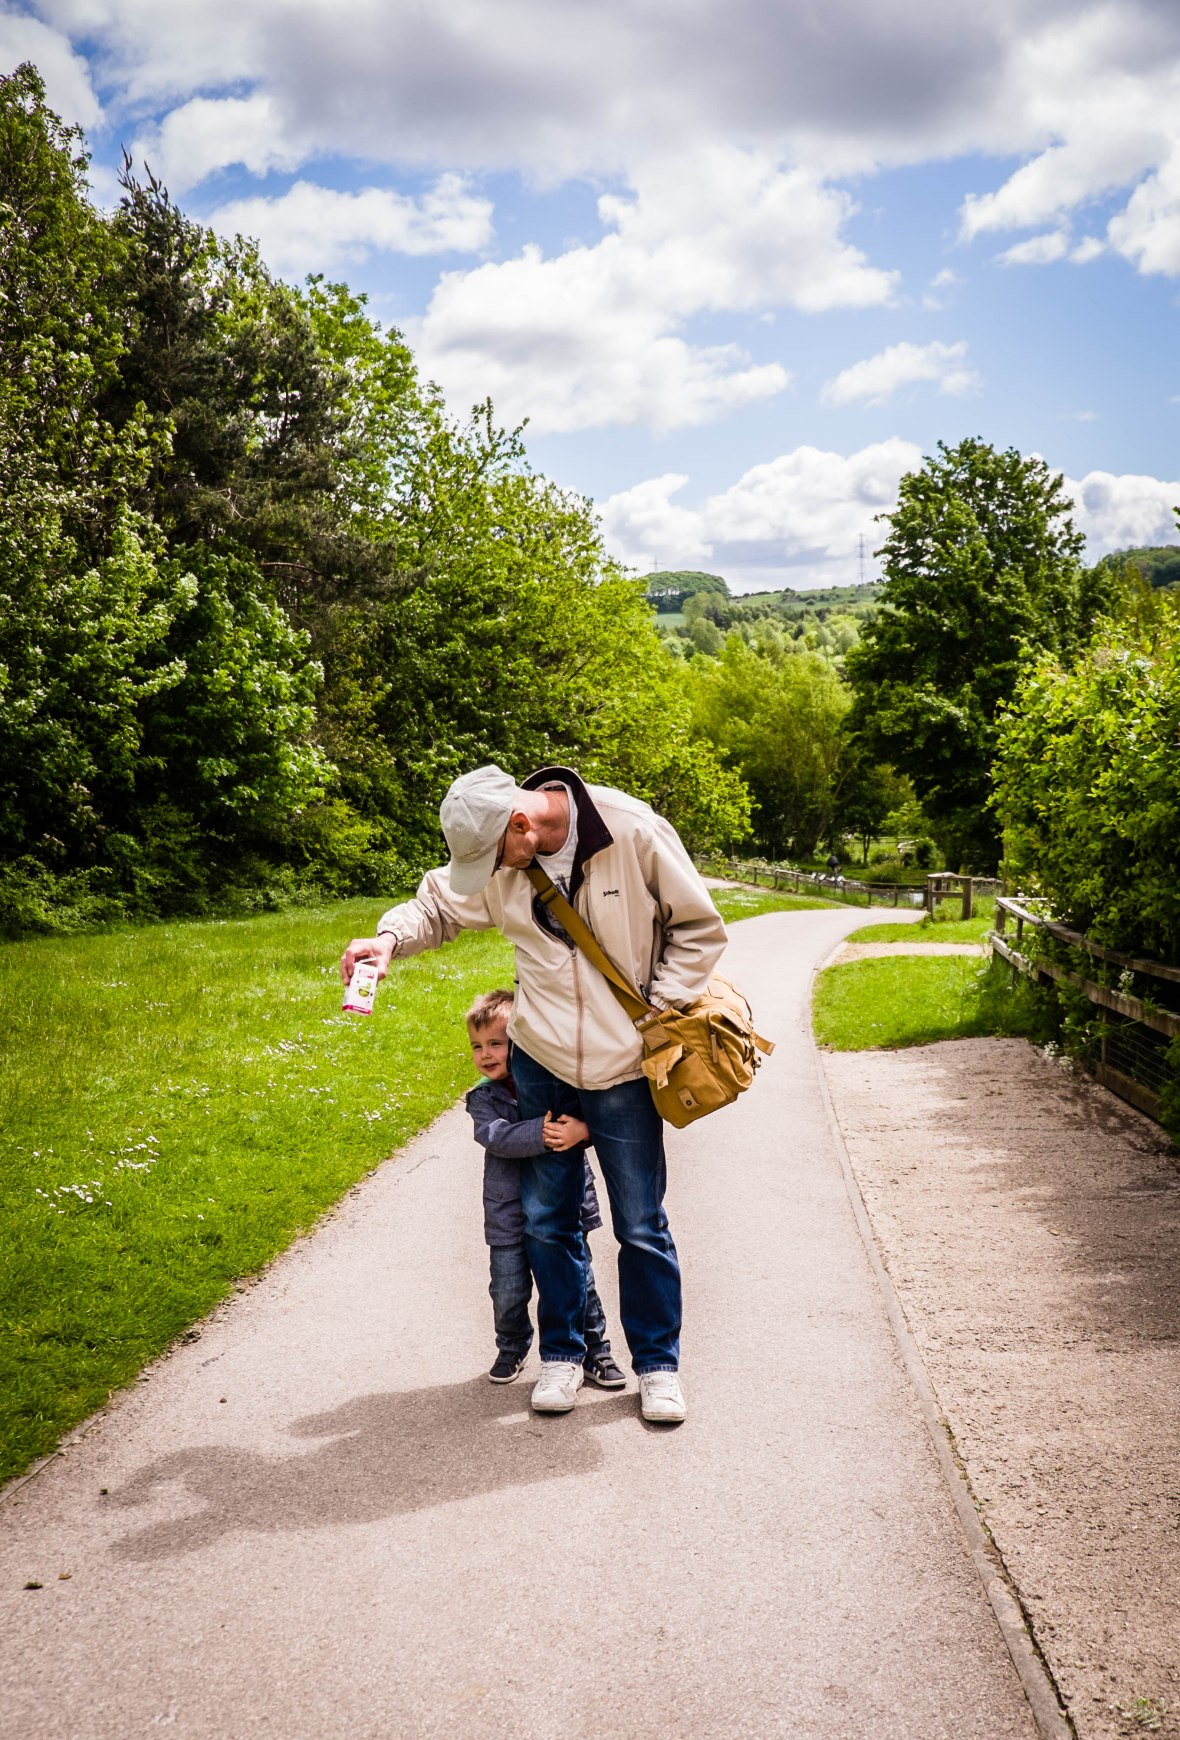 carry me Grandad!